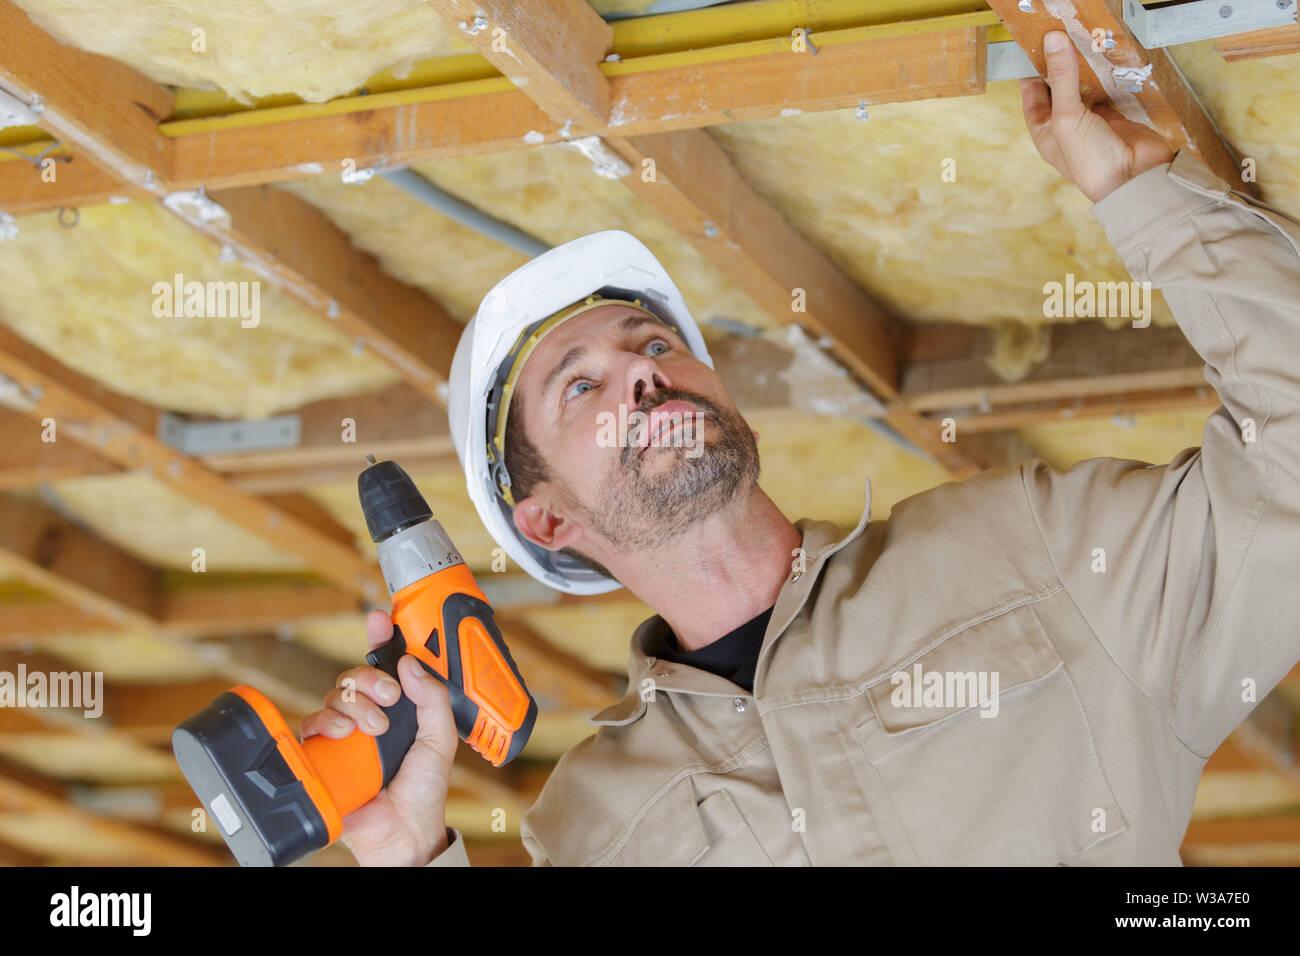 male builder using drill on wooden ceiling framework - Stock Image